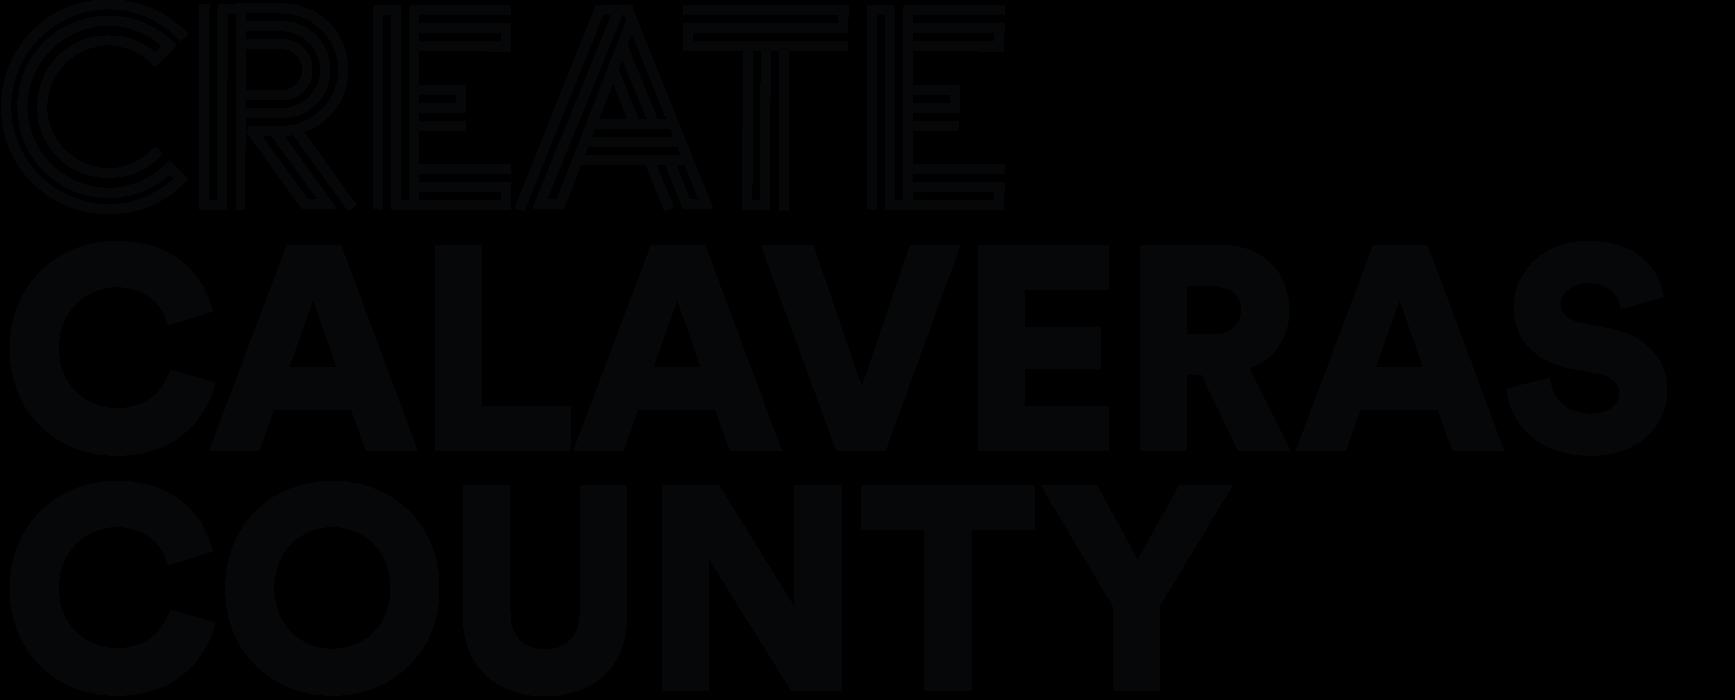 https://secureservercdn.net/198.71.233.51/mgq.552.myftpupload.com/wp-content/uploads/2020/01/Create-Ca-County-Logos-04-e1580493293421.png?time=1591126550